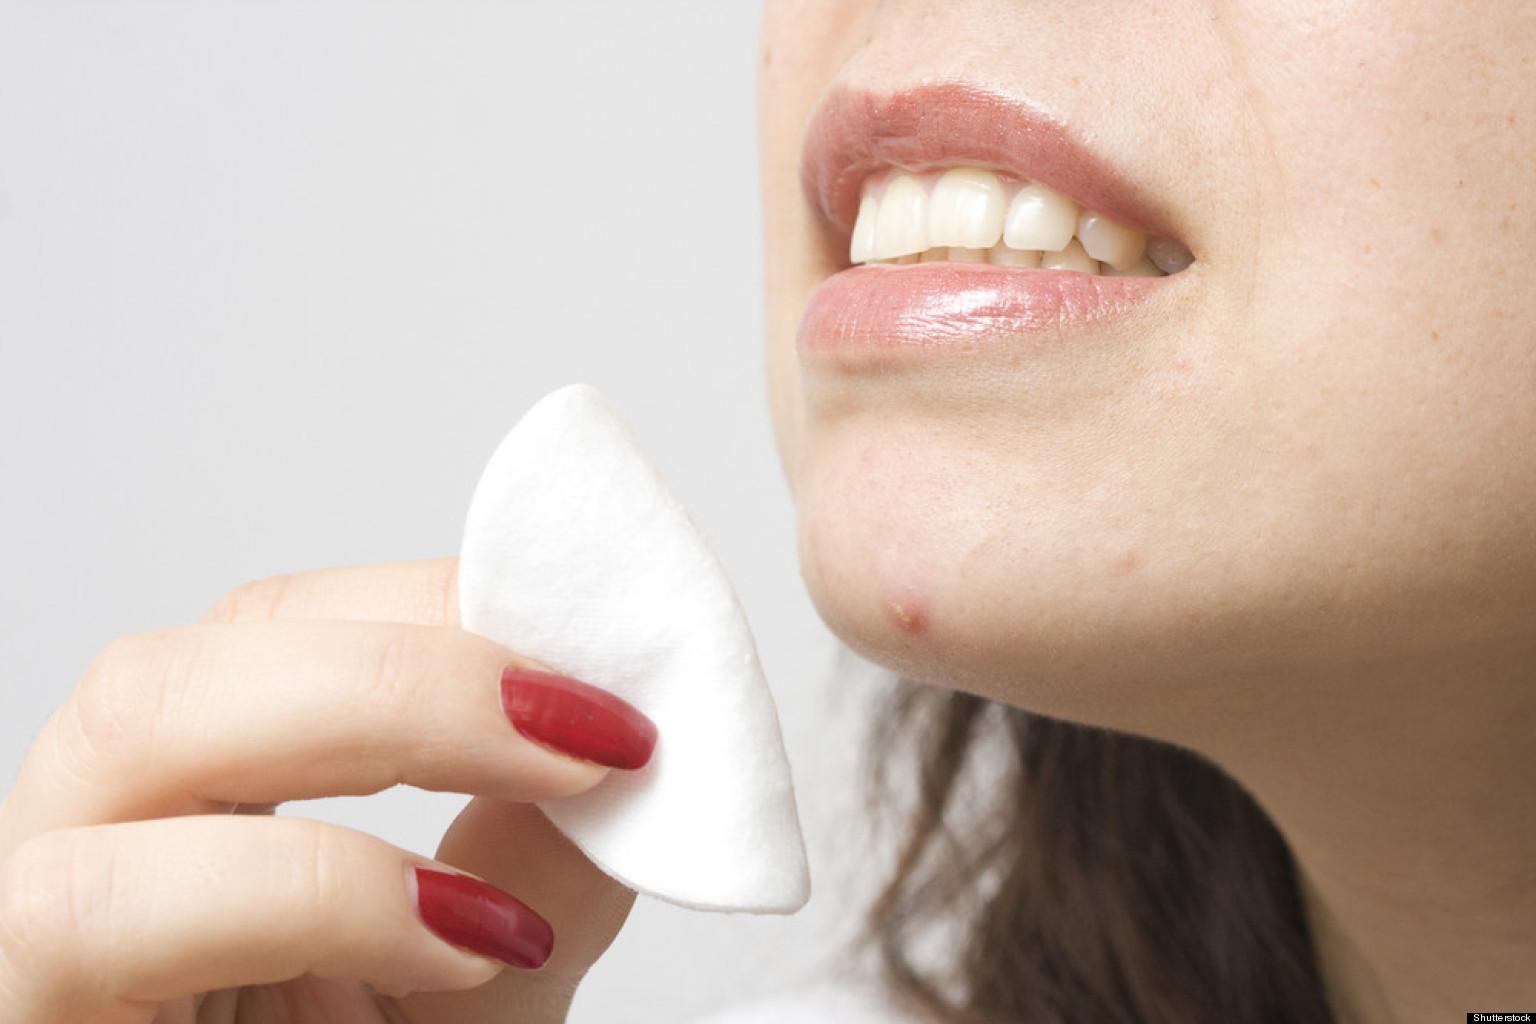 fight acne with regenis acne treatment spray.